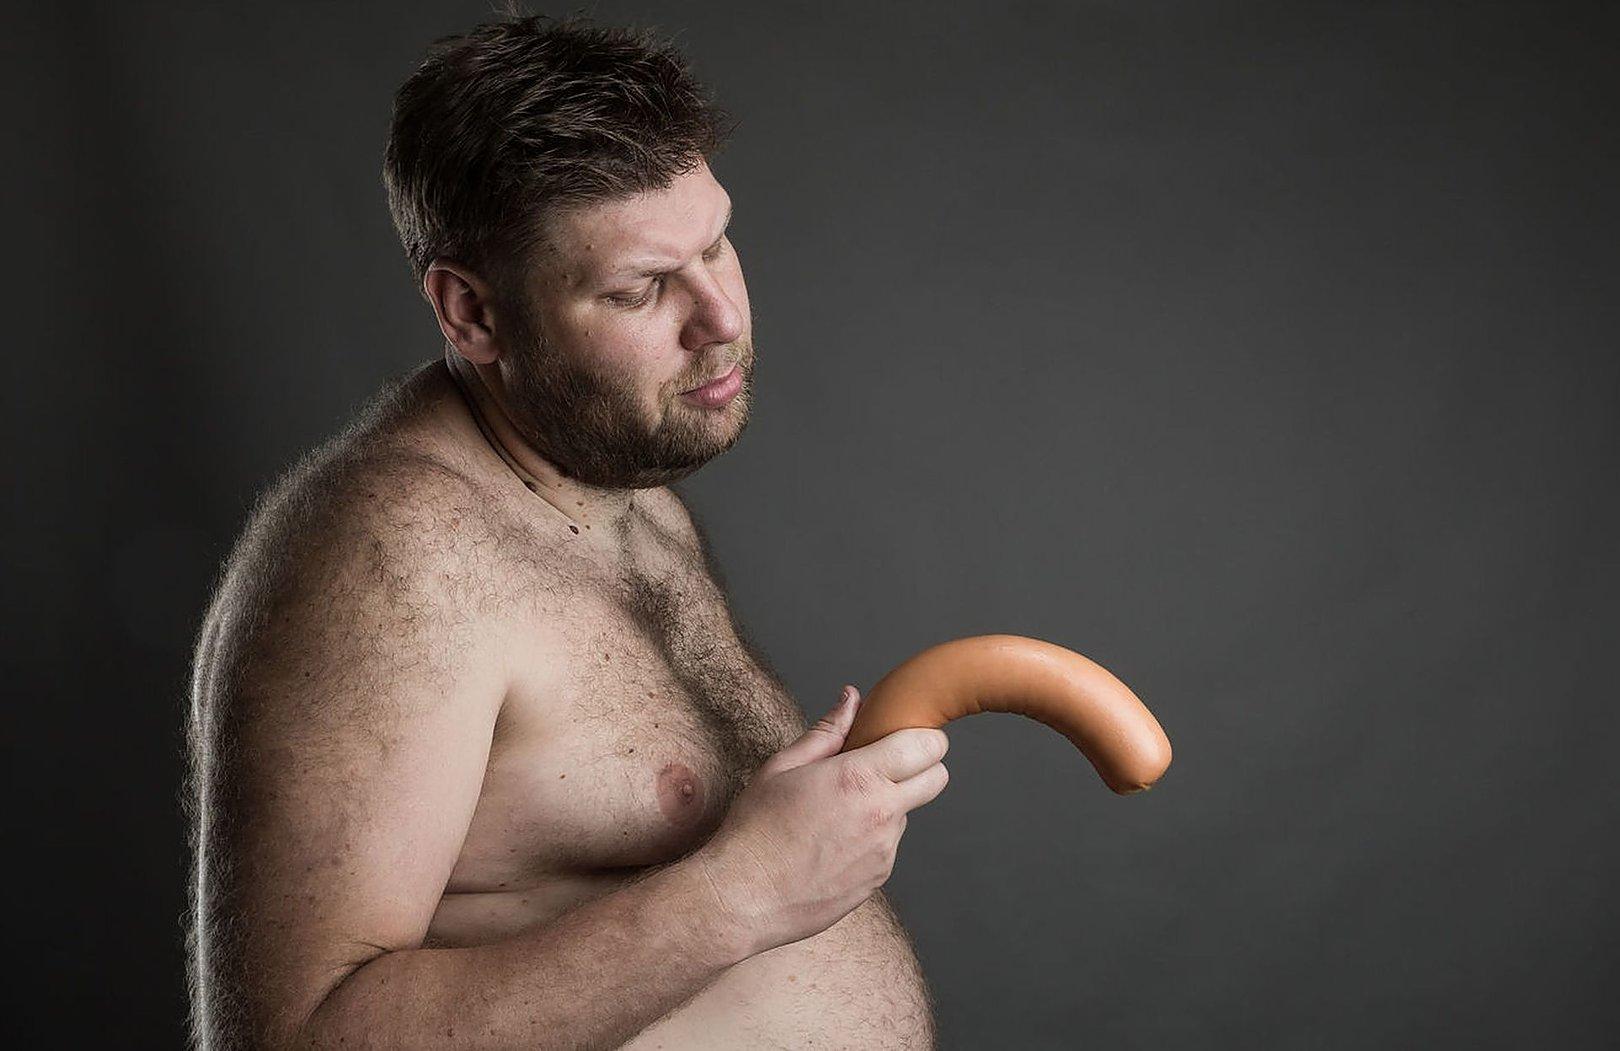 Средства для повышения либидо у мужчин